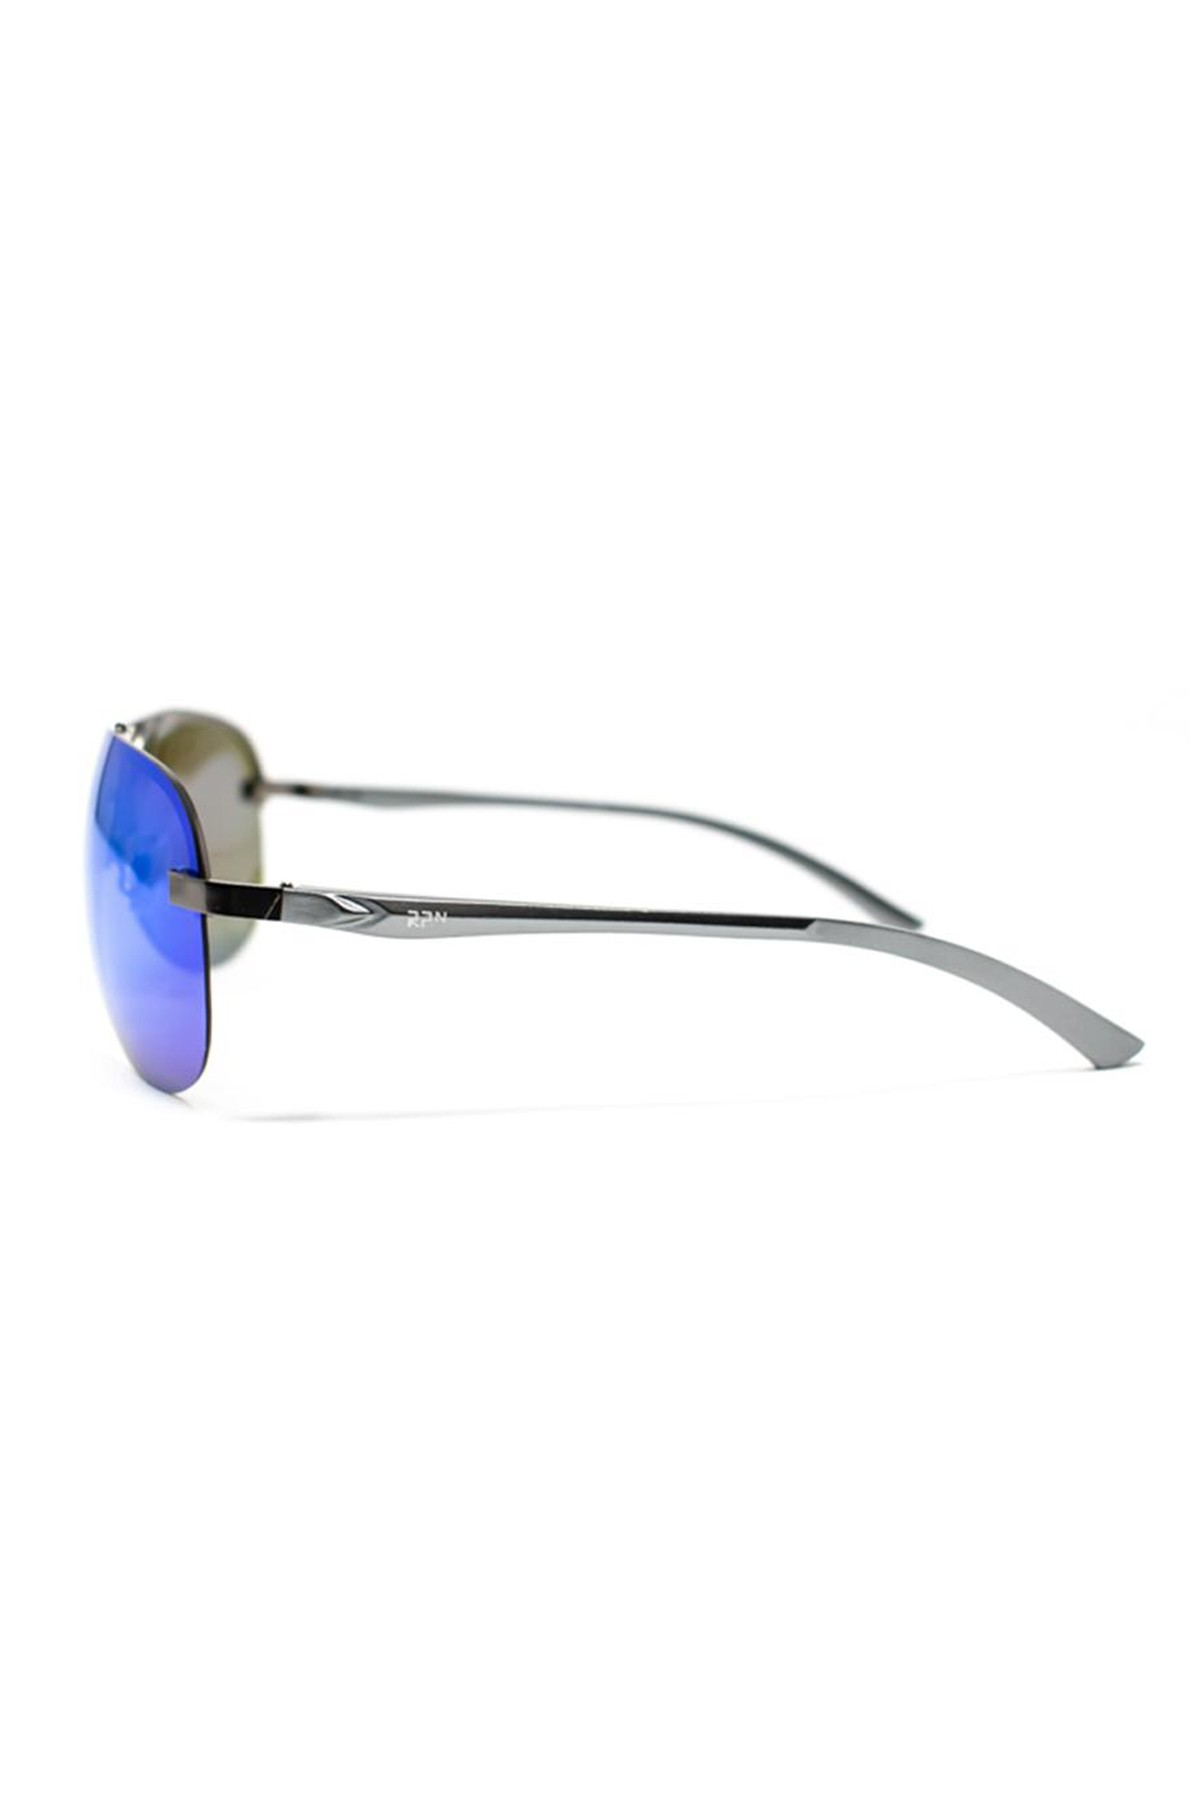 fb6b3b0c9f Γυαλιά ηλίου Polarized P9214 - Abebablom Store